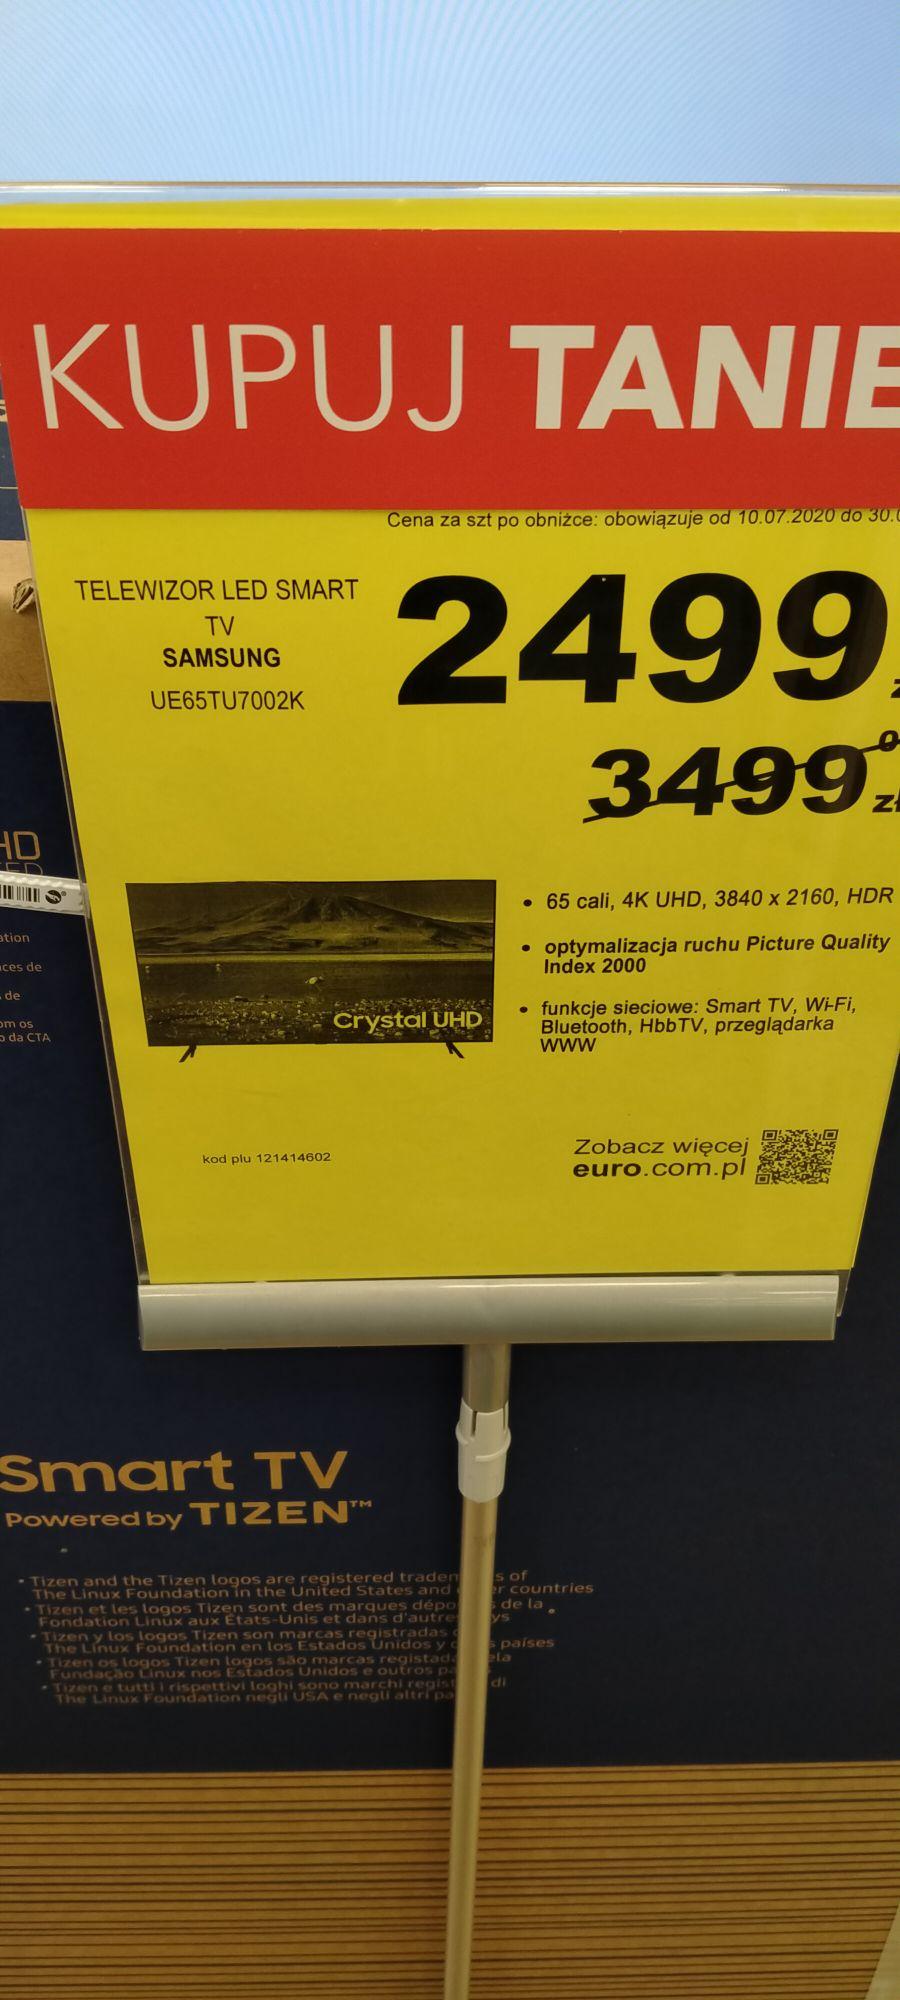 Telewizor Samsung UE65TU7002K 1000 PLN taniej.